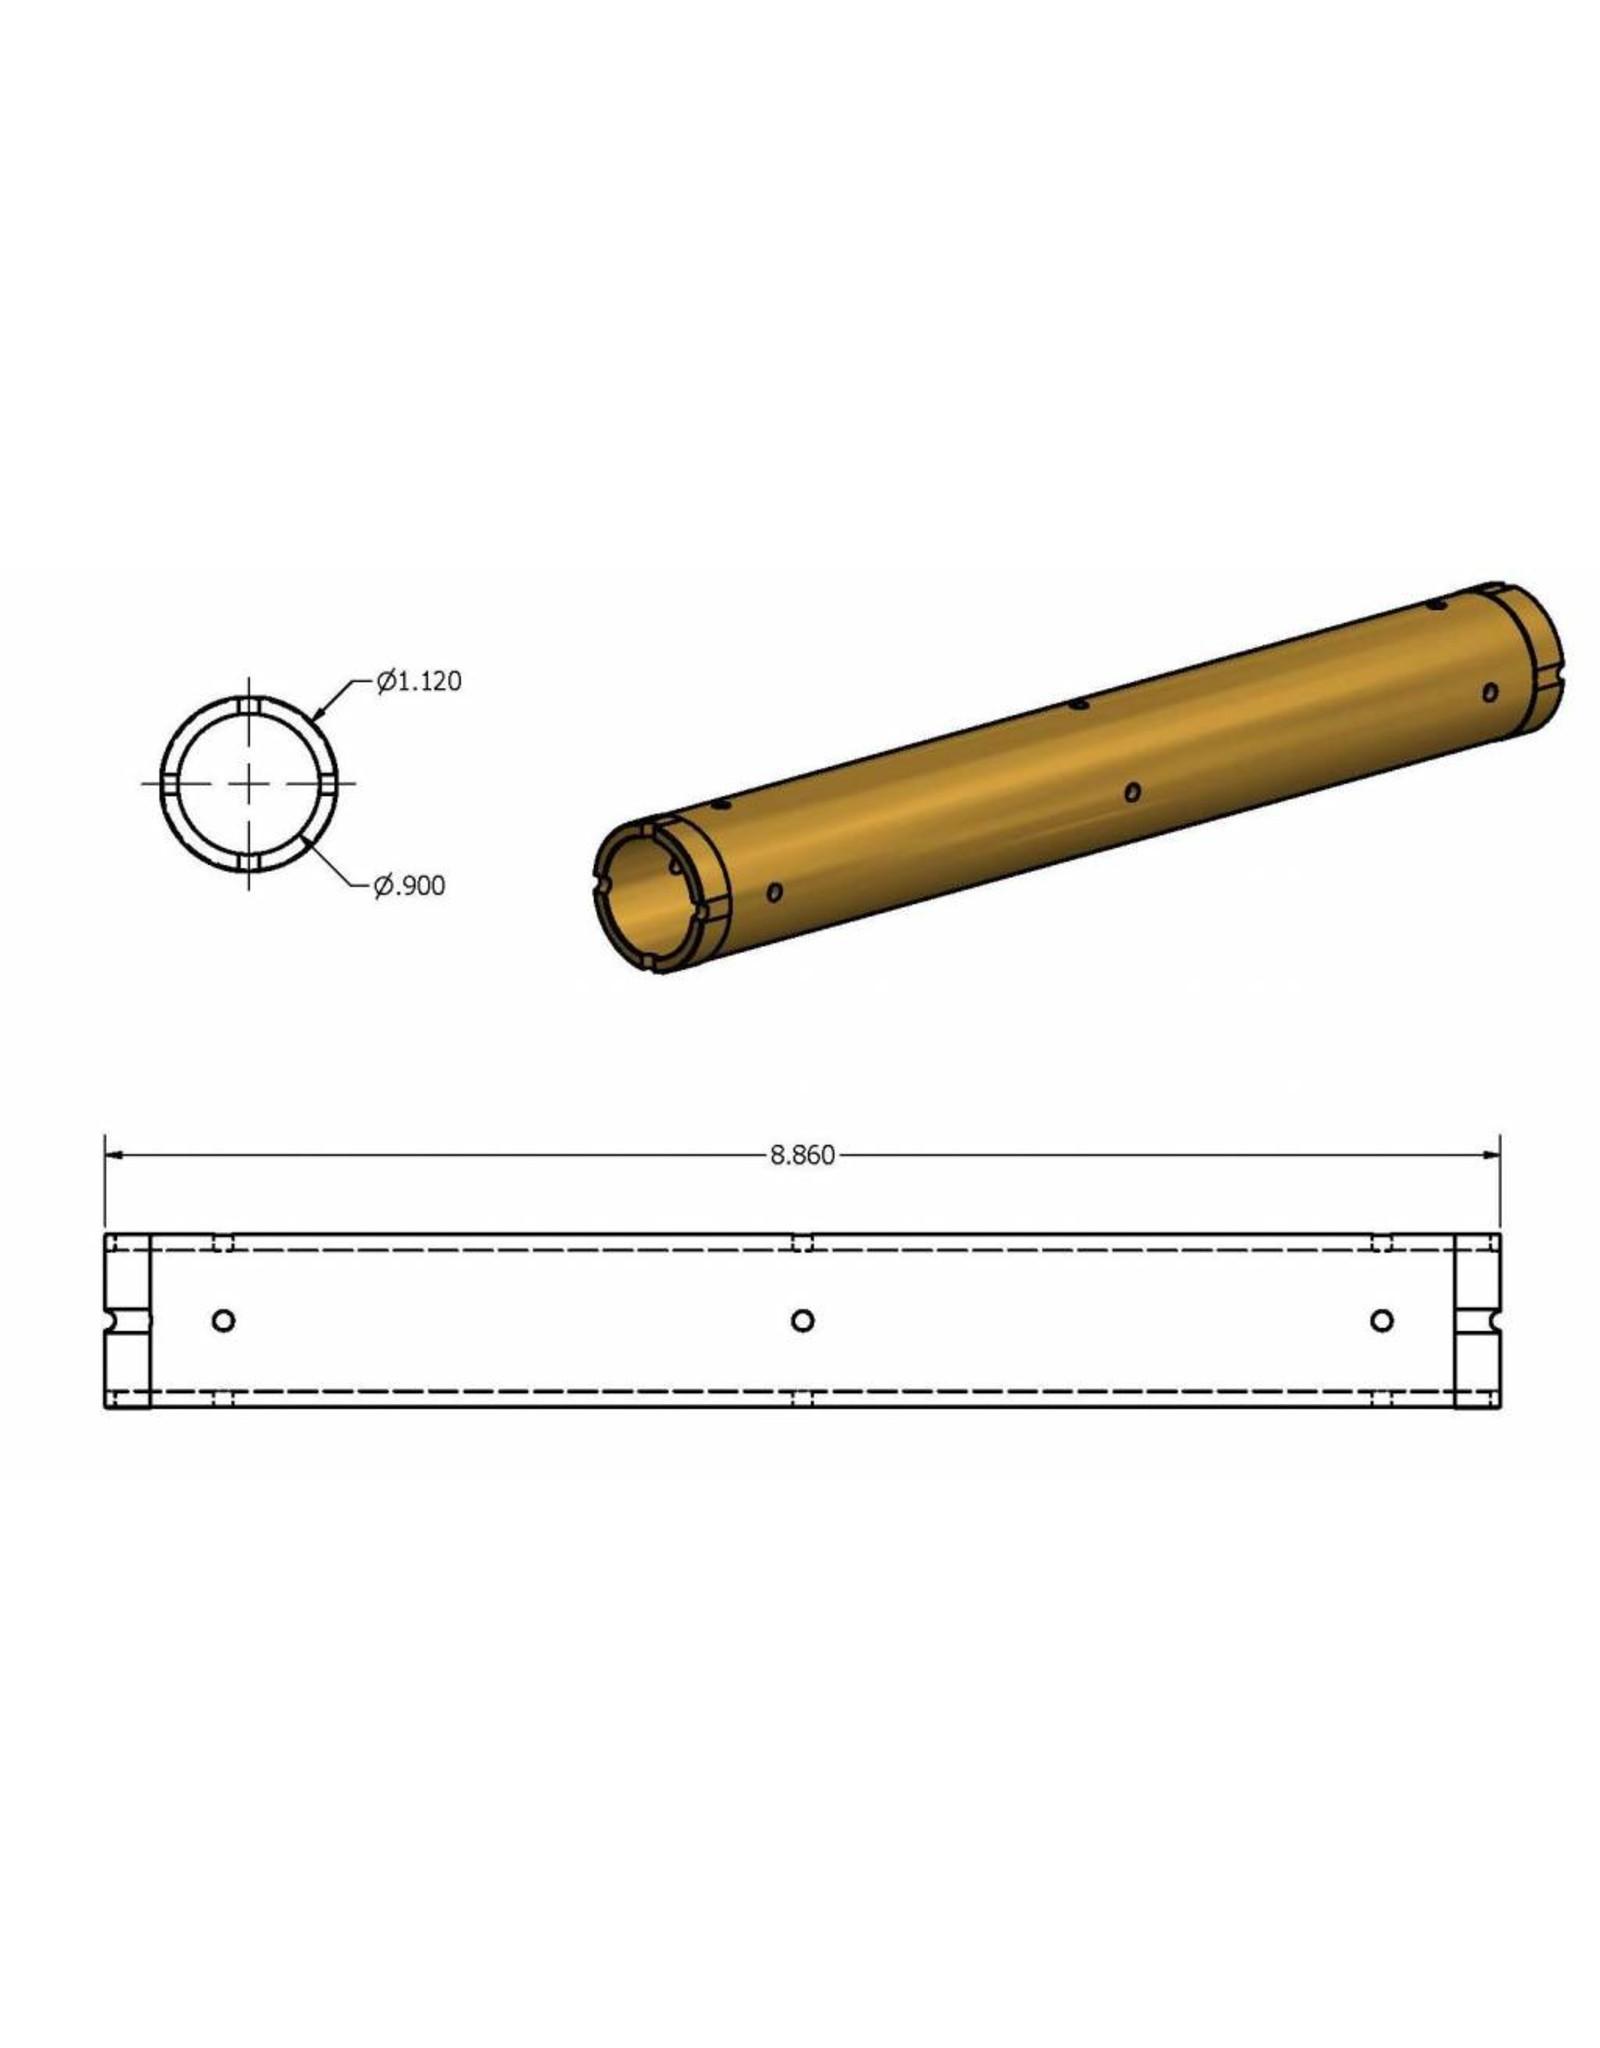 KMT Style Liner, High Pressure Cylinder, SL5, 100S, Brass